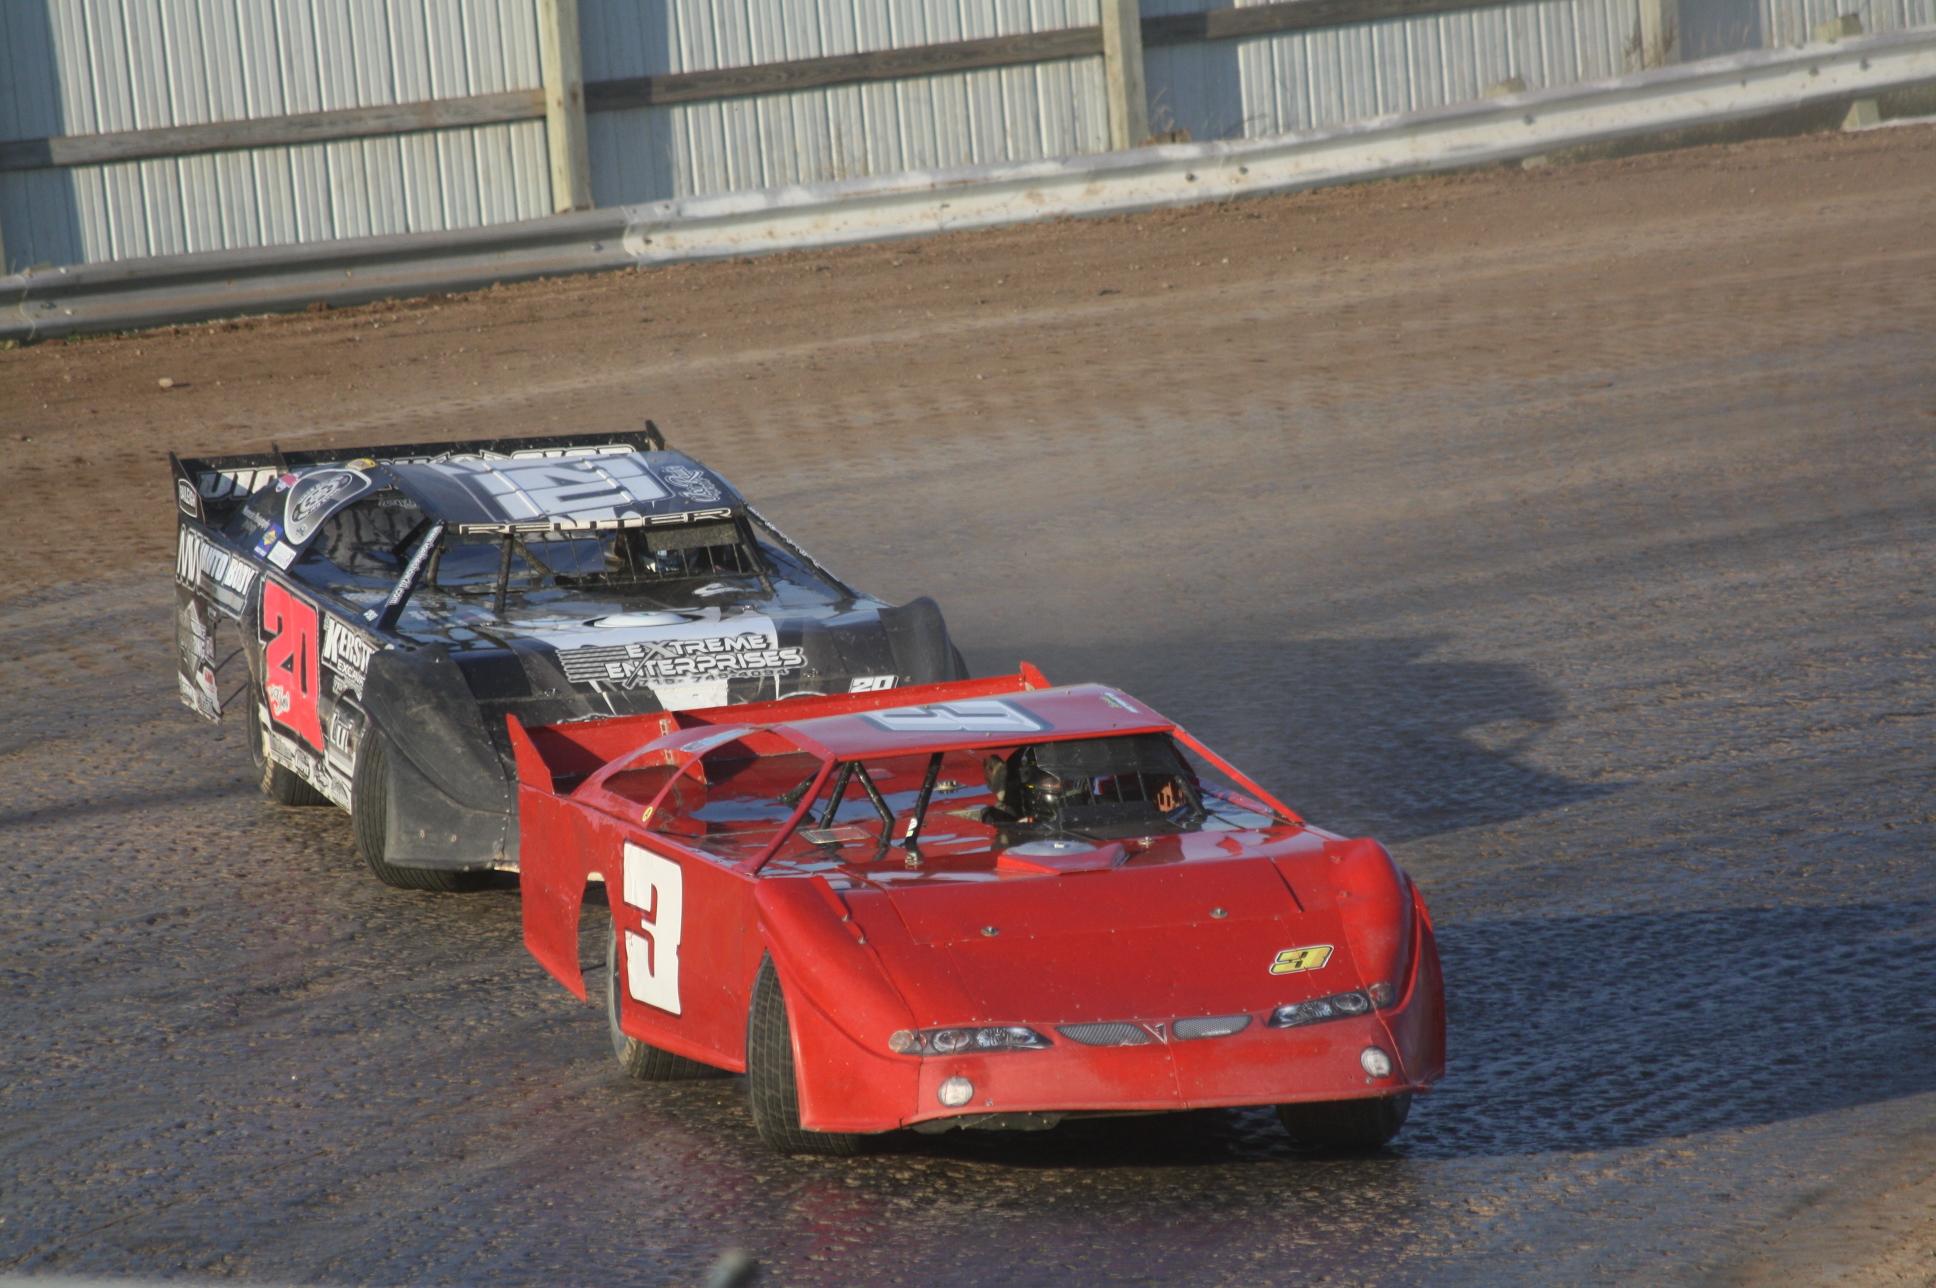 HSO 1973 Championship Cars v1.0  Slick_Dirt_Track_Calumet_County_Speedway_Late_Models_September_2011